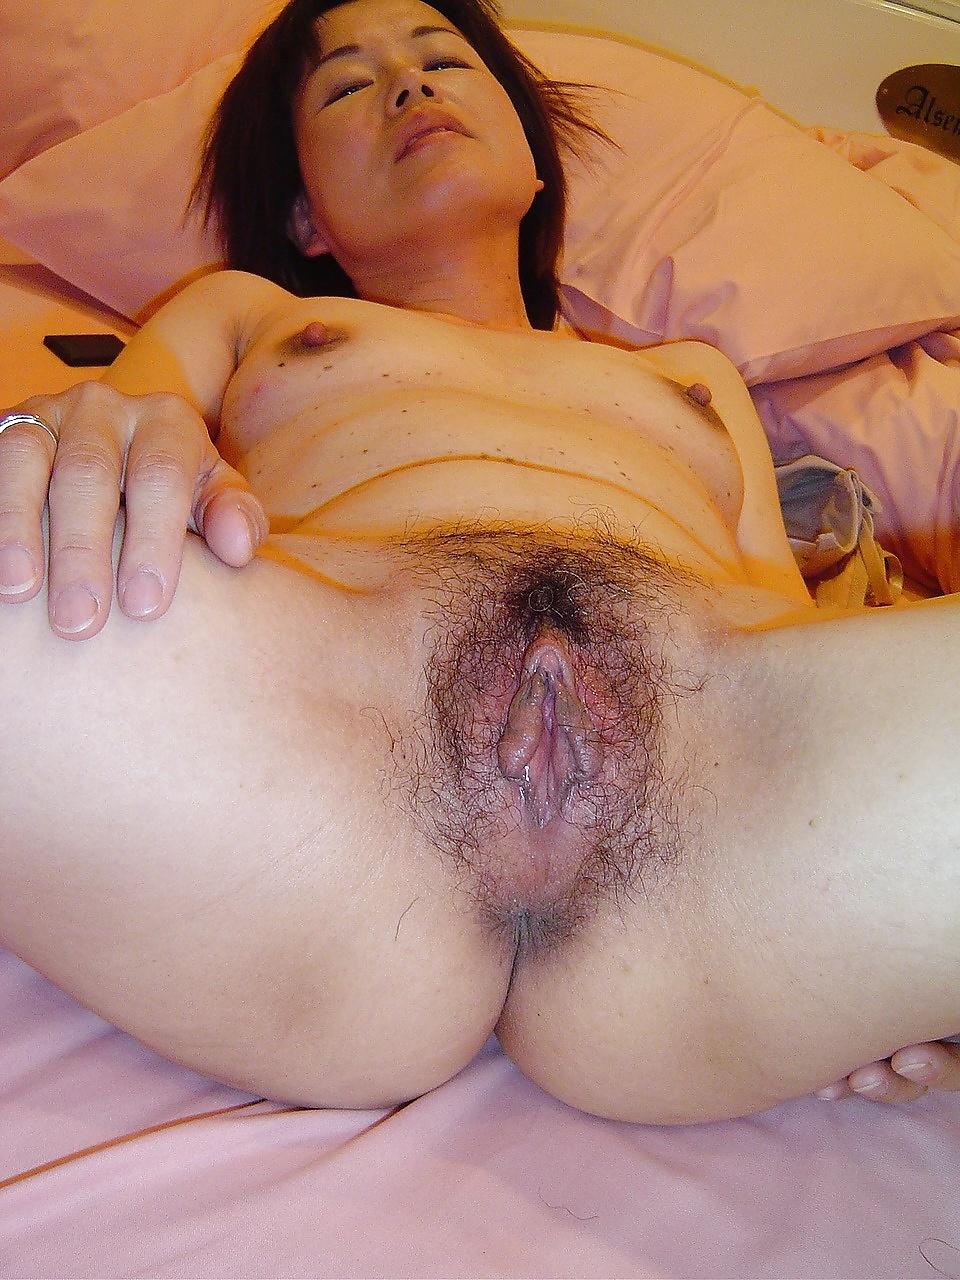 Asian mature women nude adult pornstars